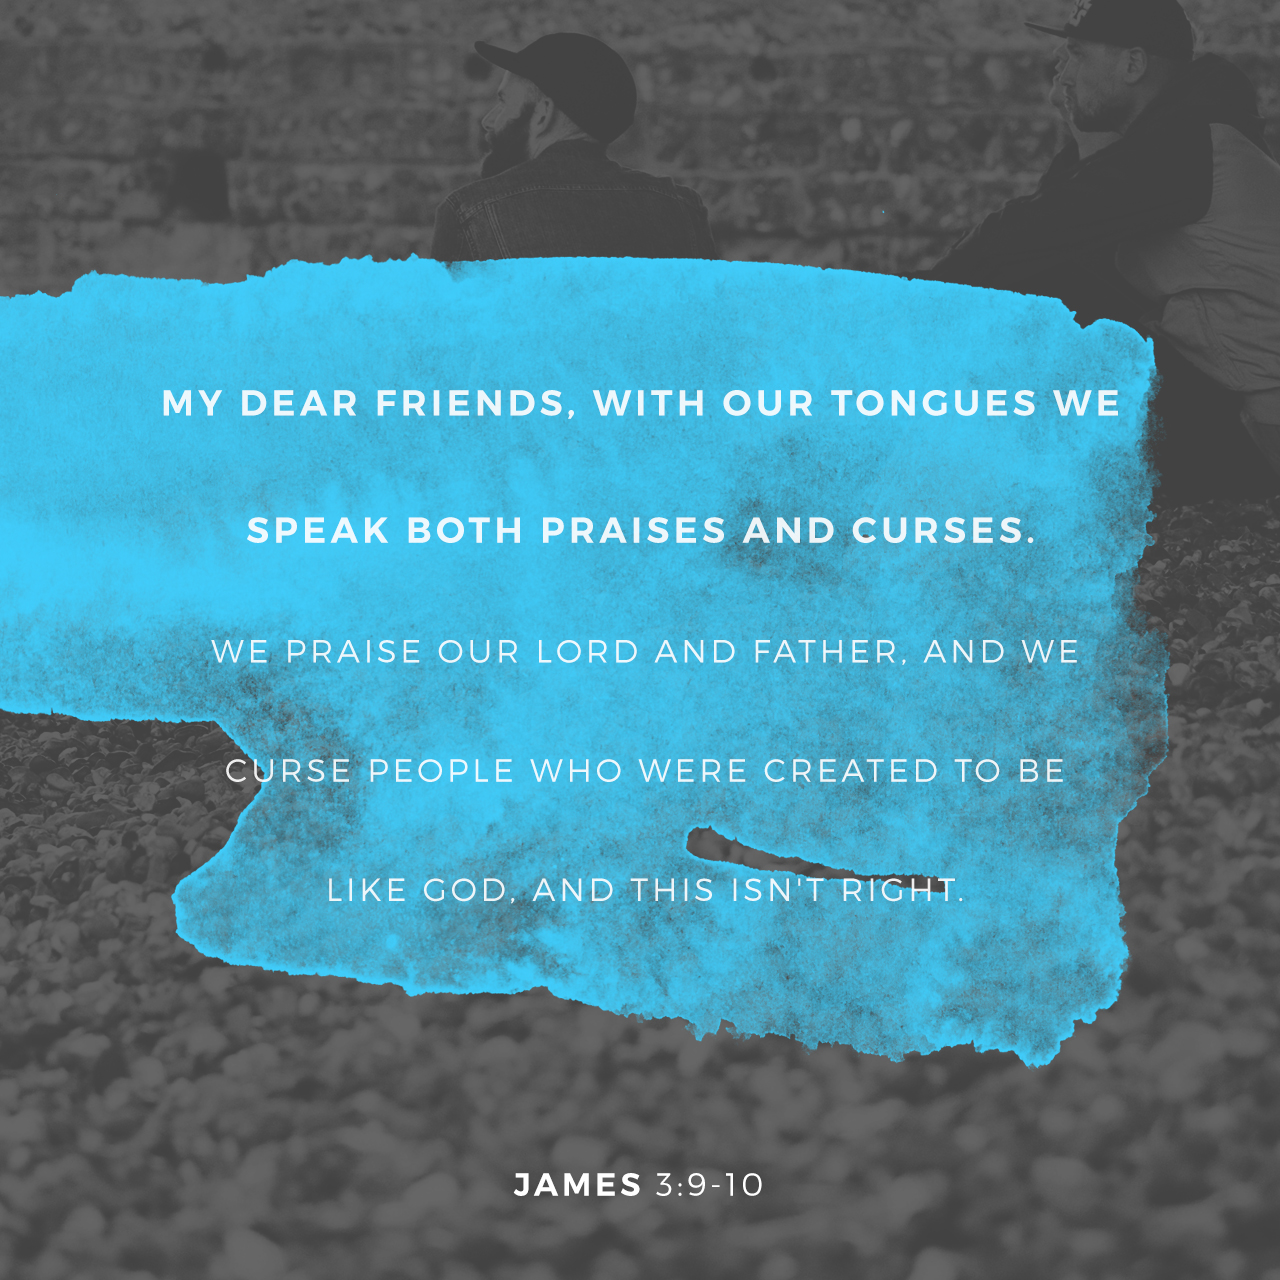 James 3:9